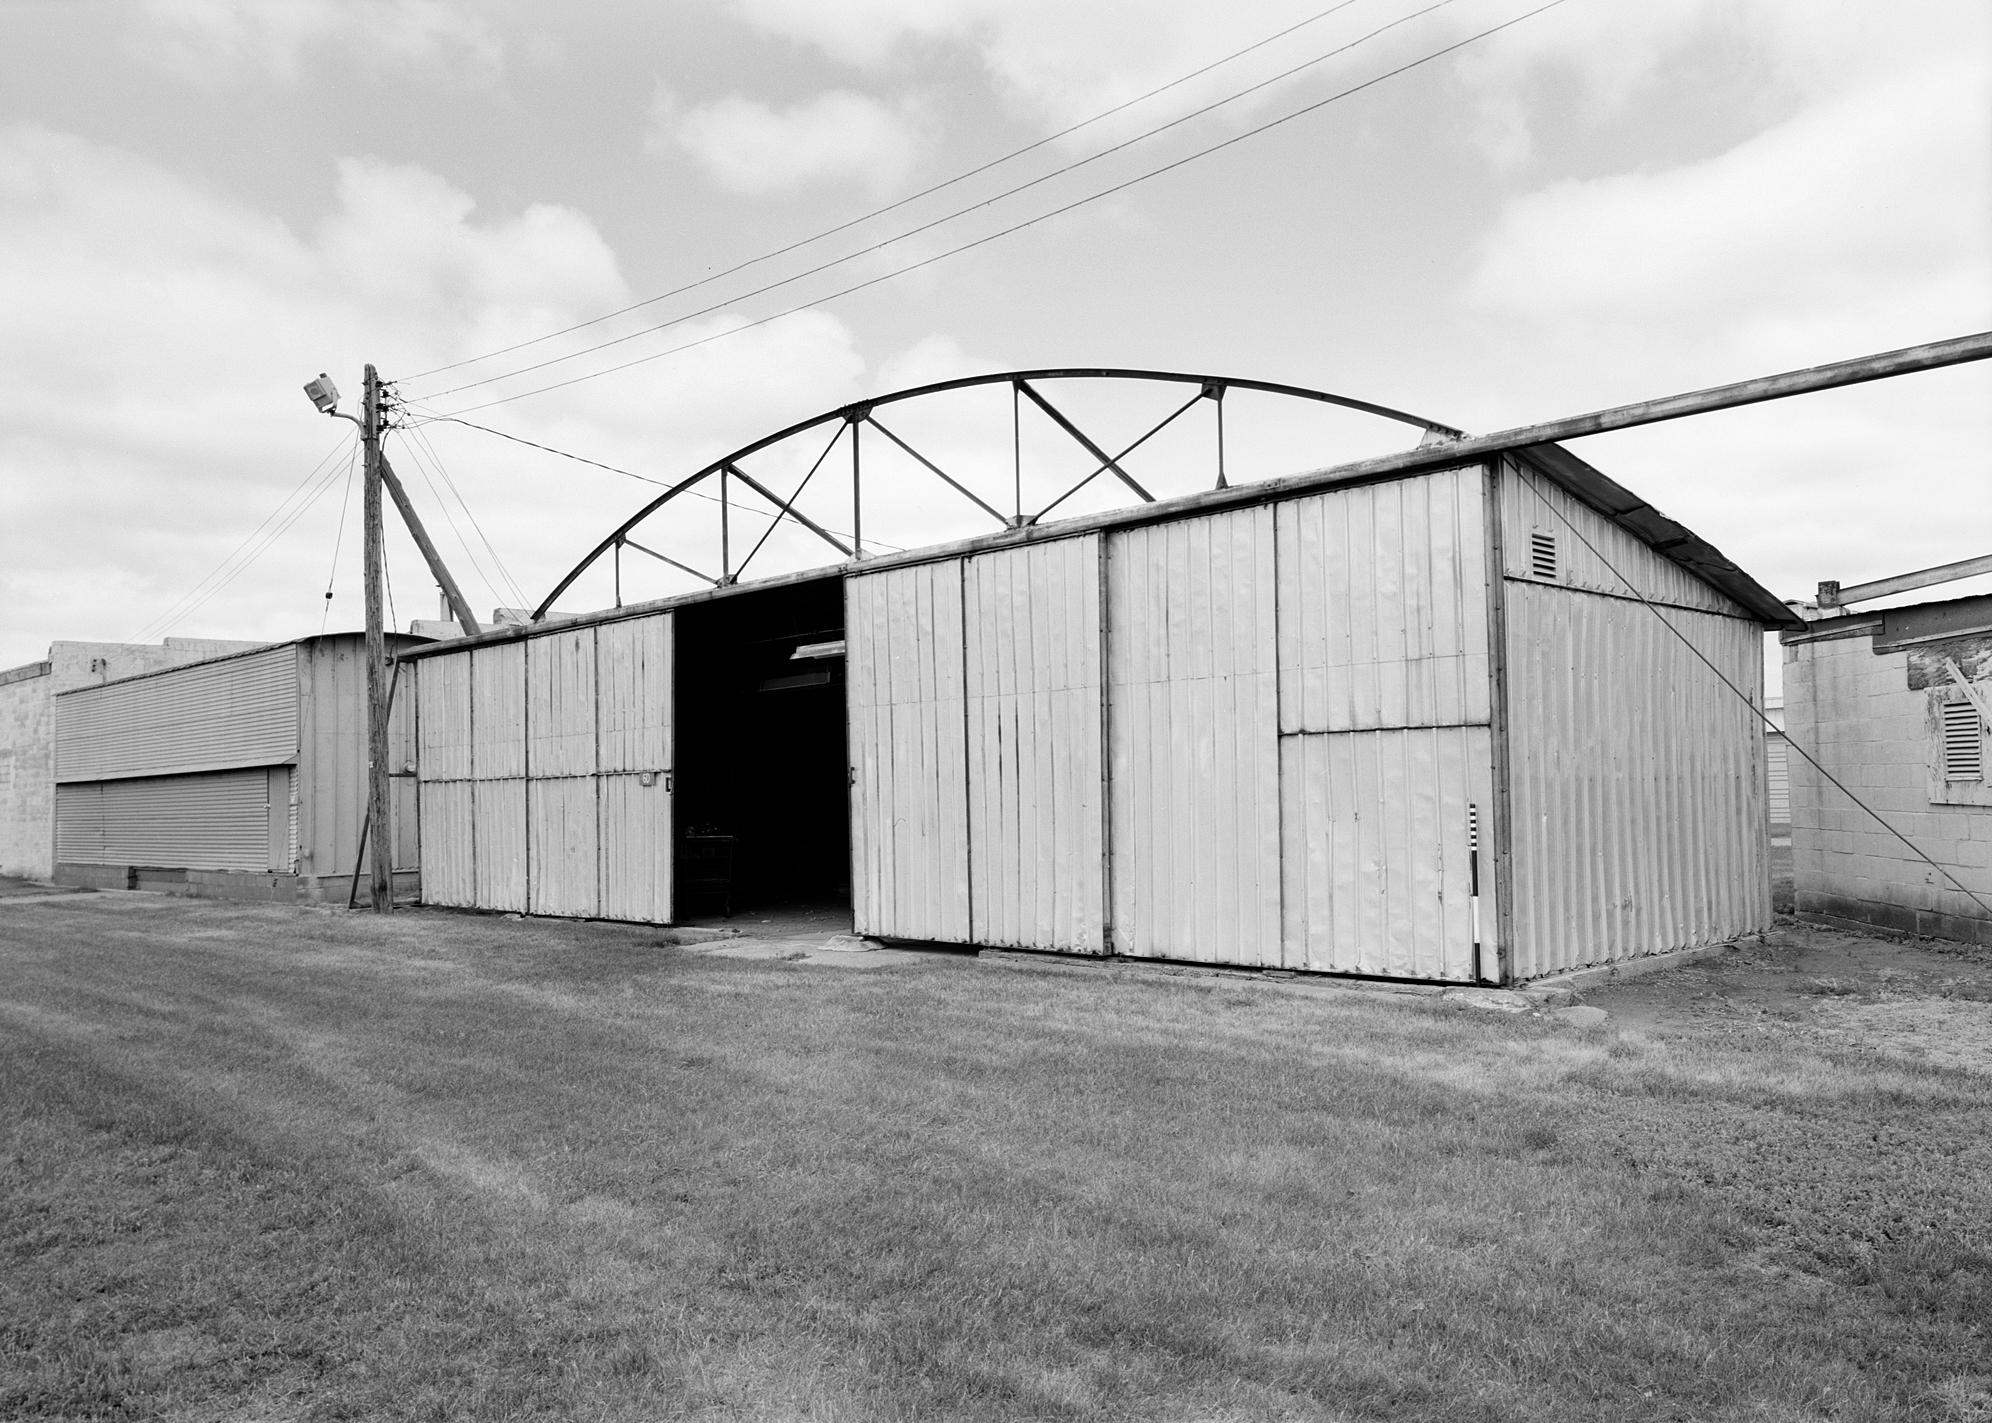 Hangar - MHPR HE-EPC-110-02 (Please credit Daniel R. Pratt and the Minnesota Historic Property Record)